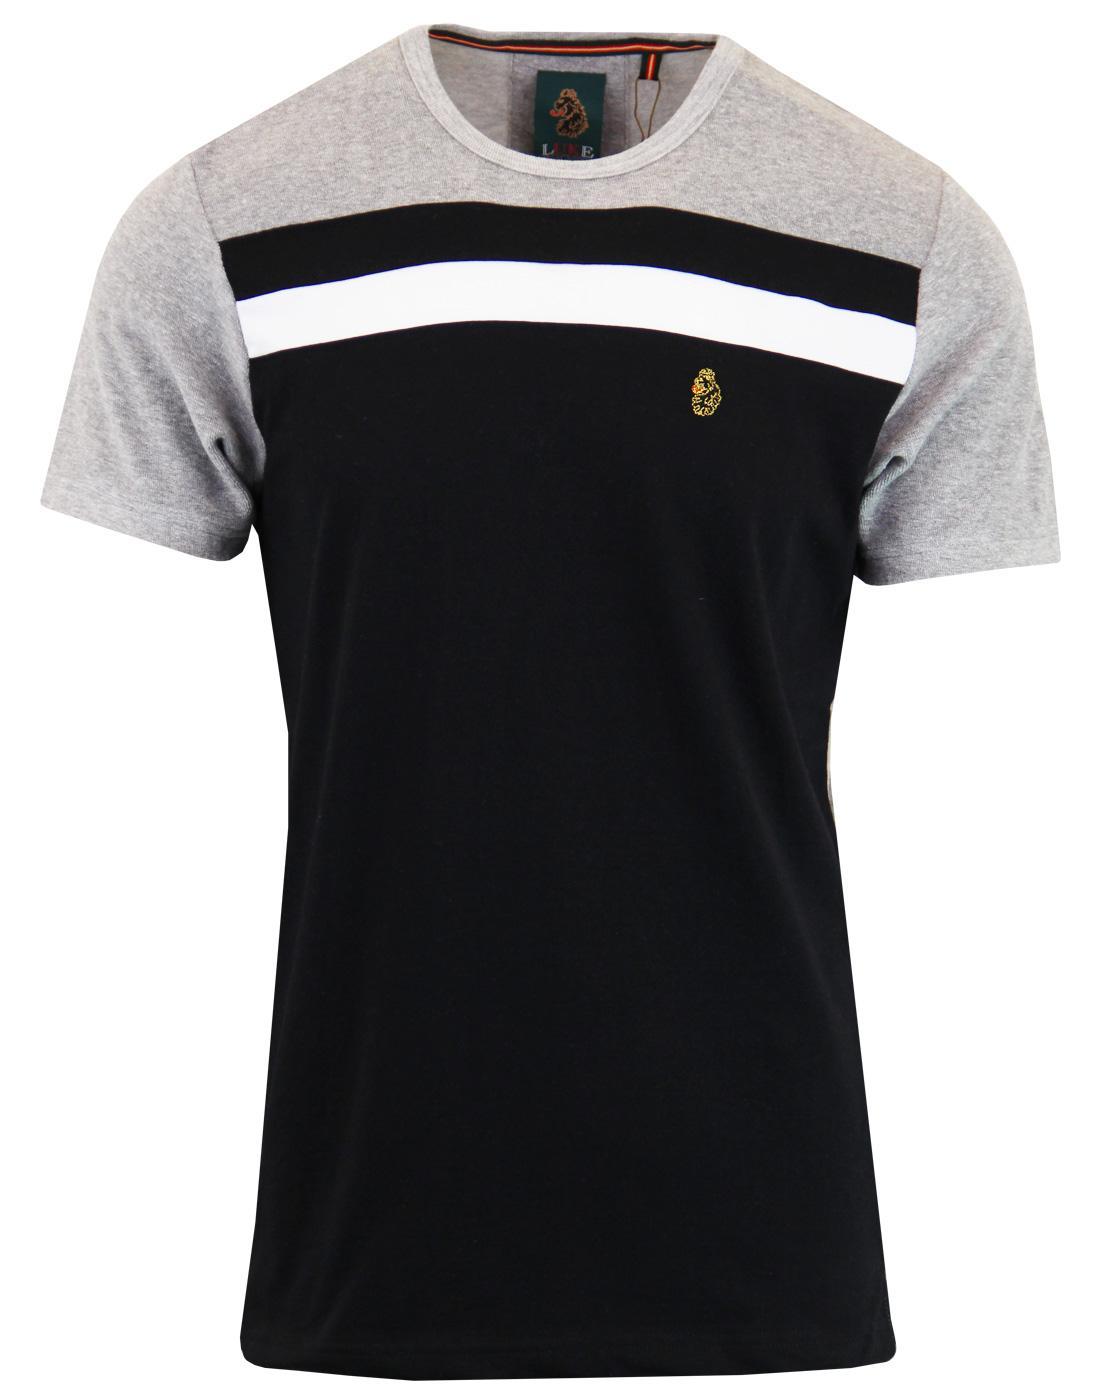 Neutral Ground LUKE Retro 70s Stripe Panel T-shirt